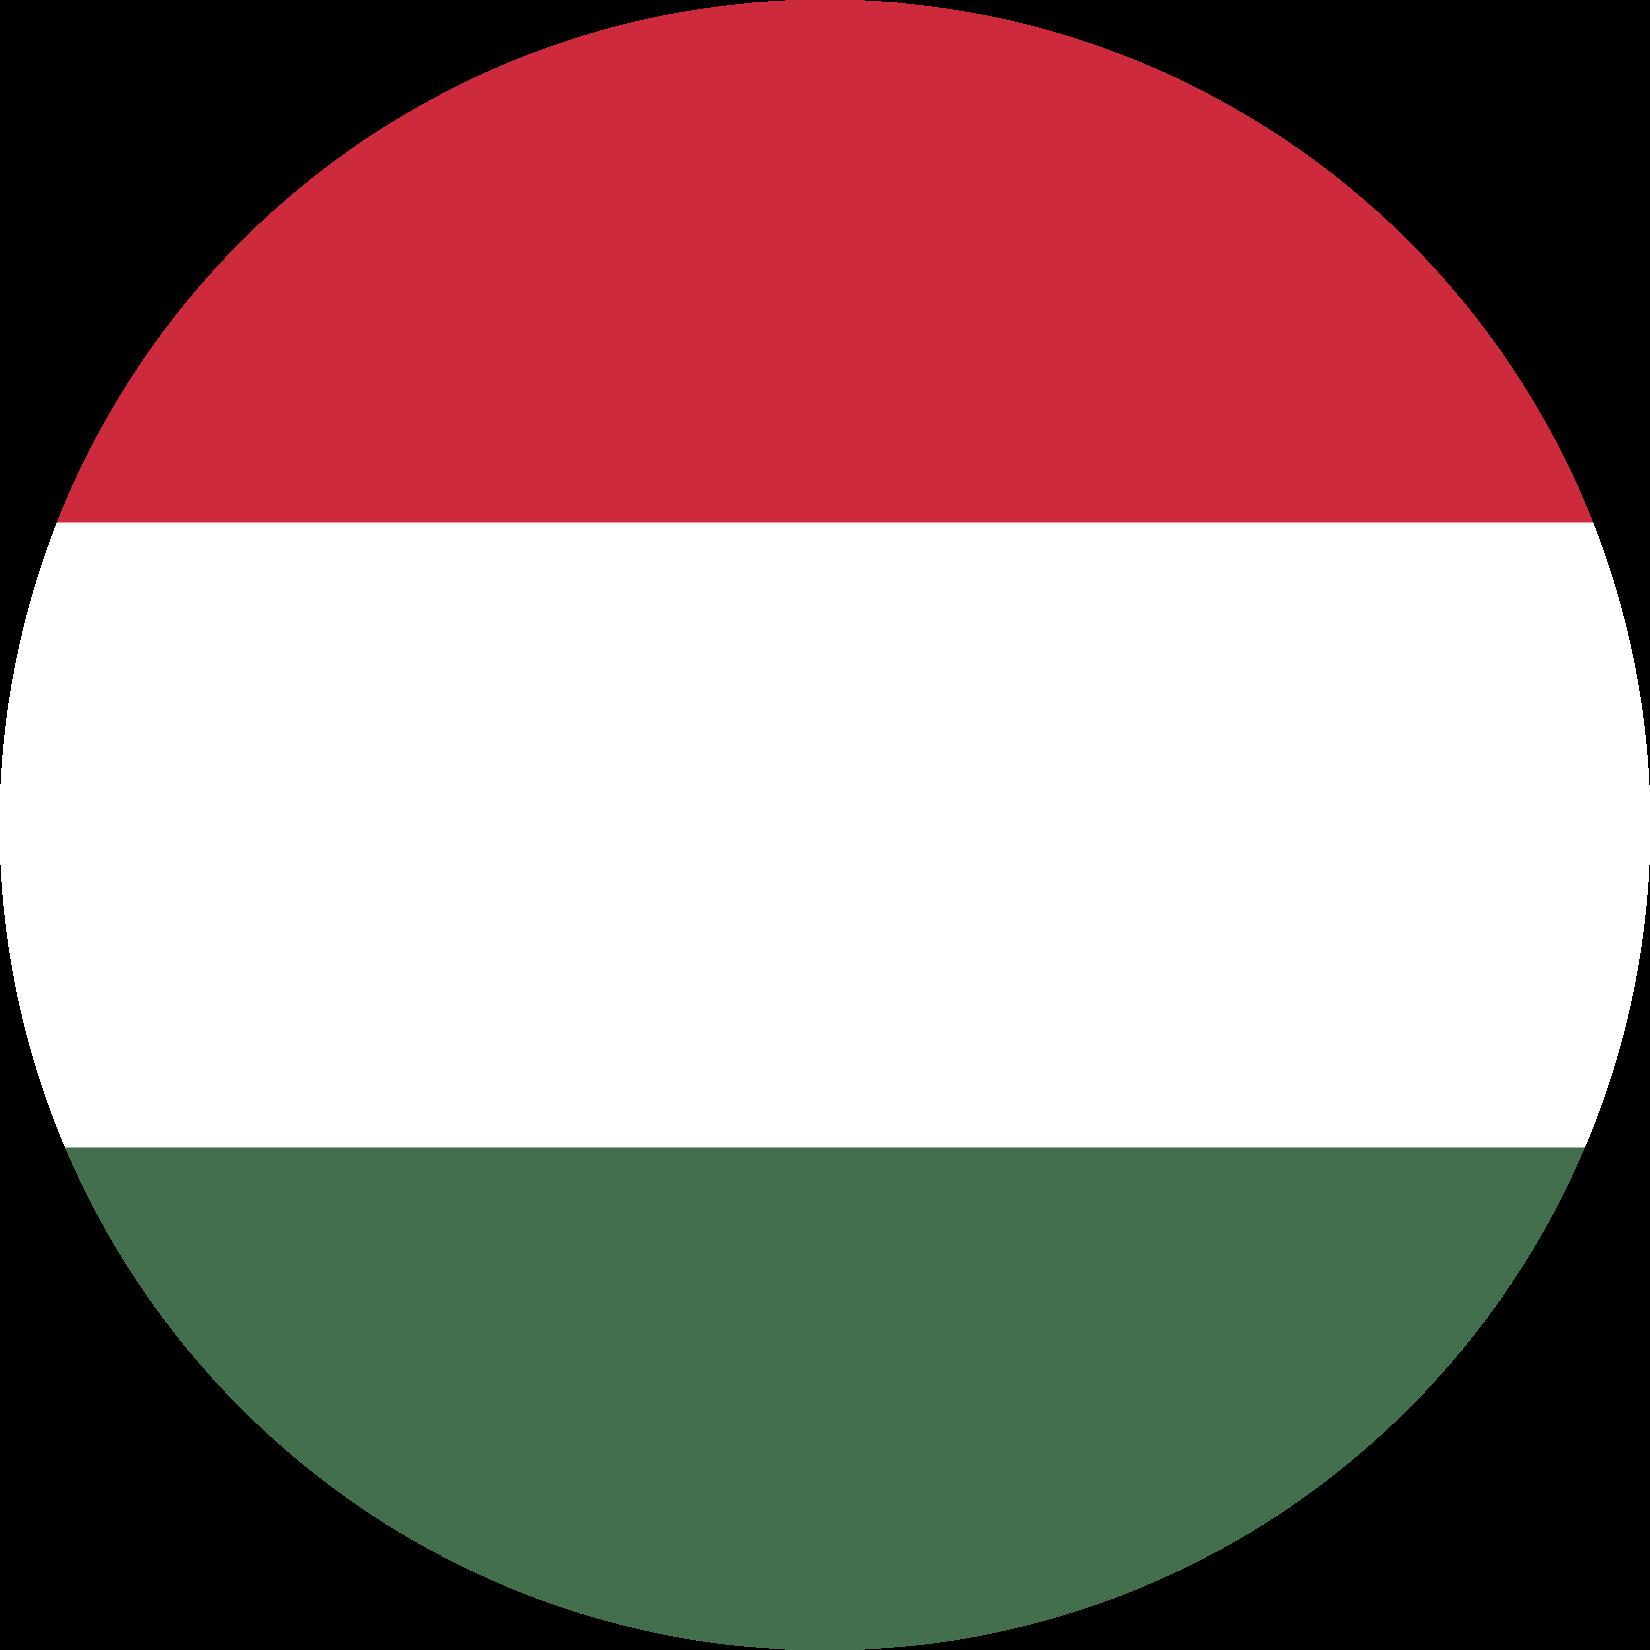 Hungary Flag Emoji